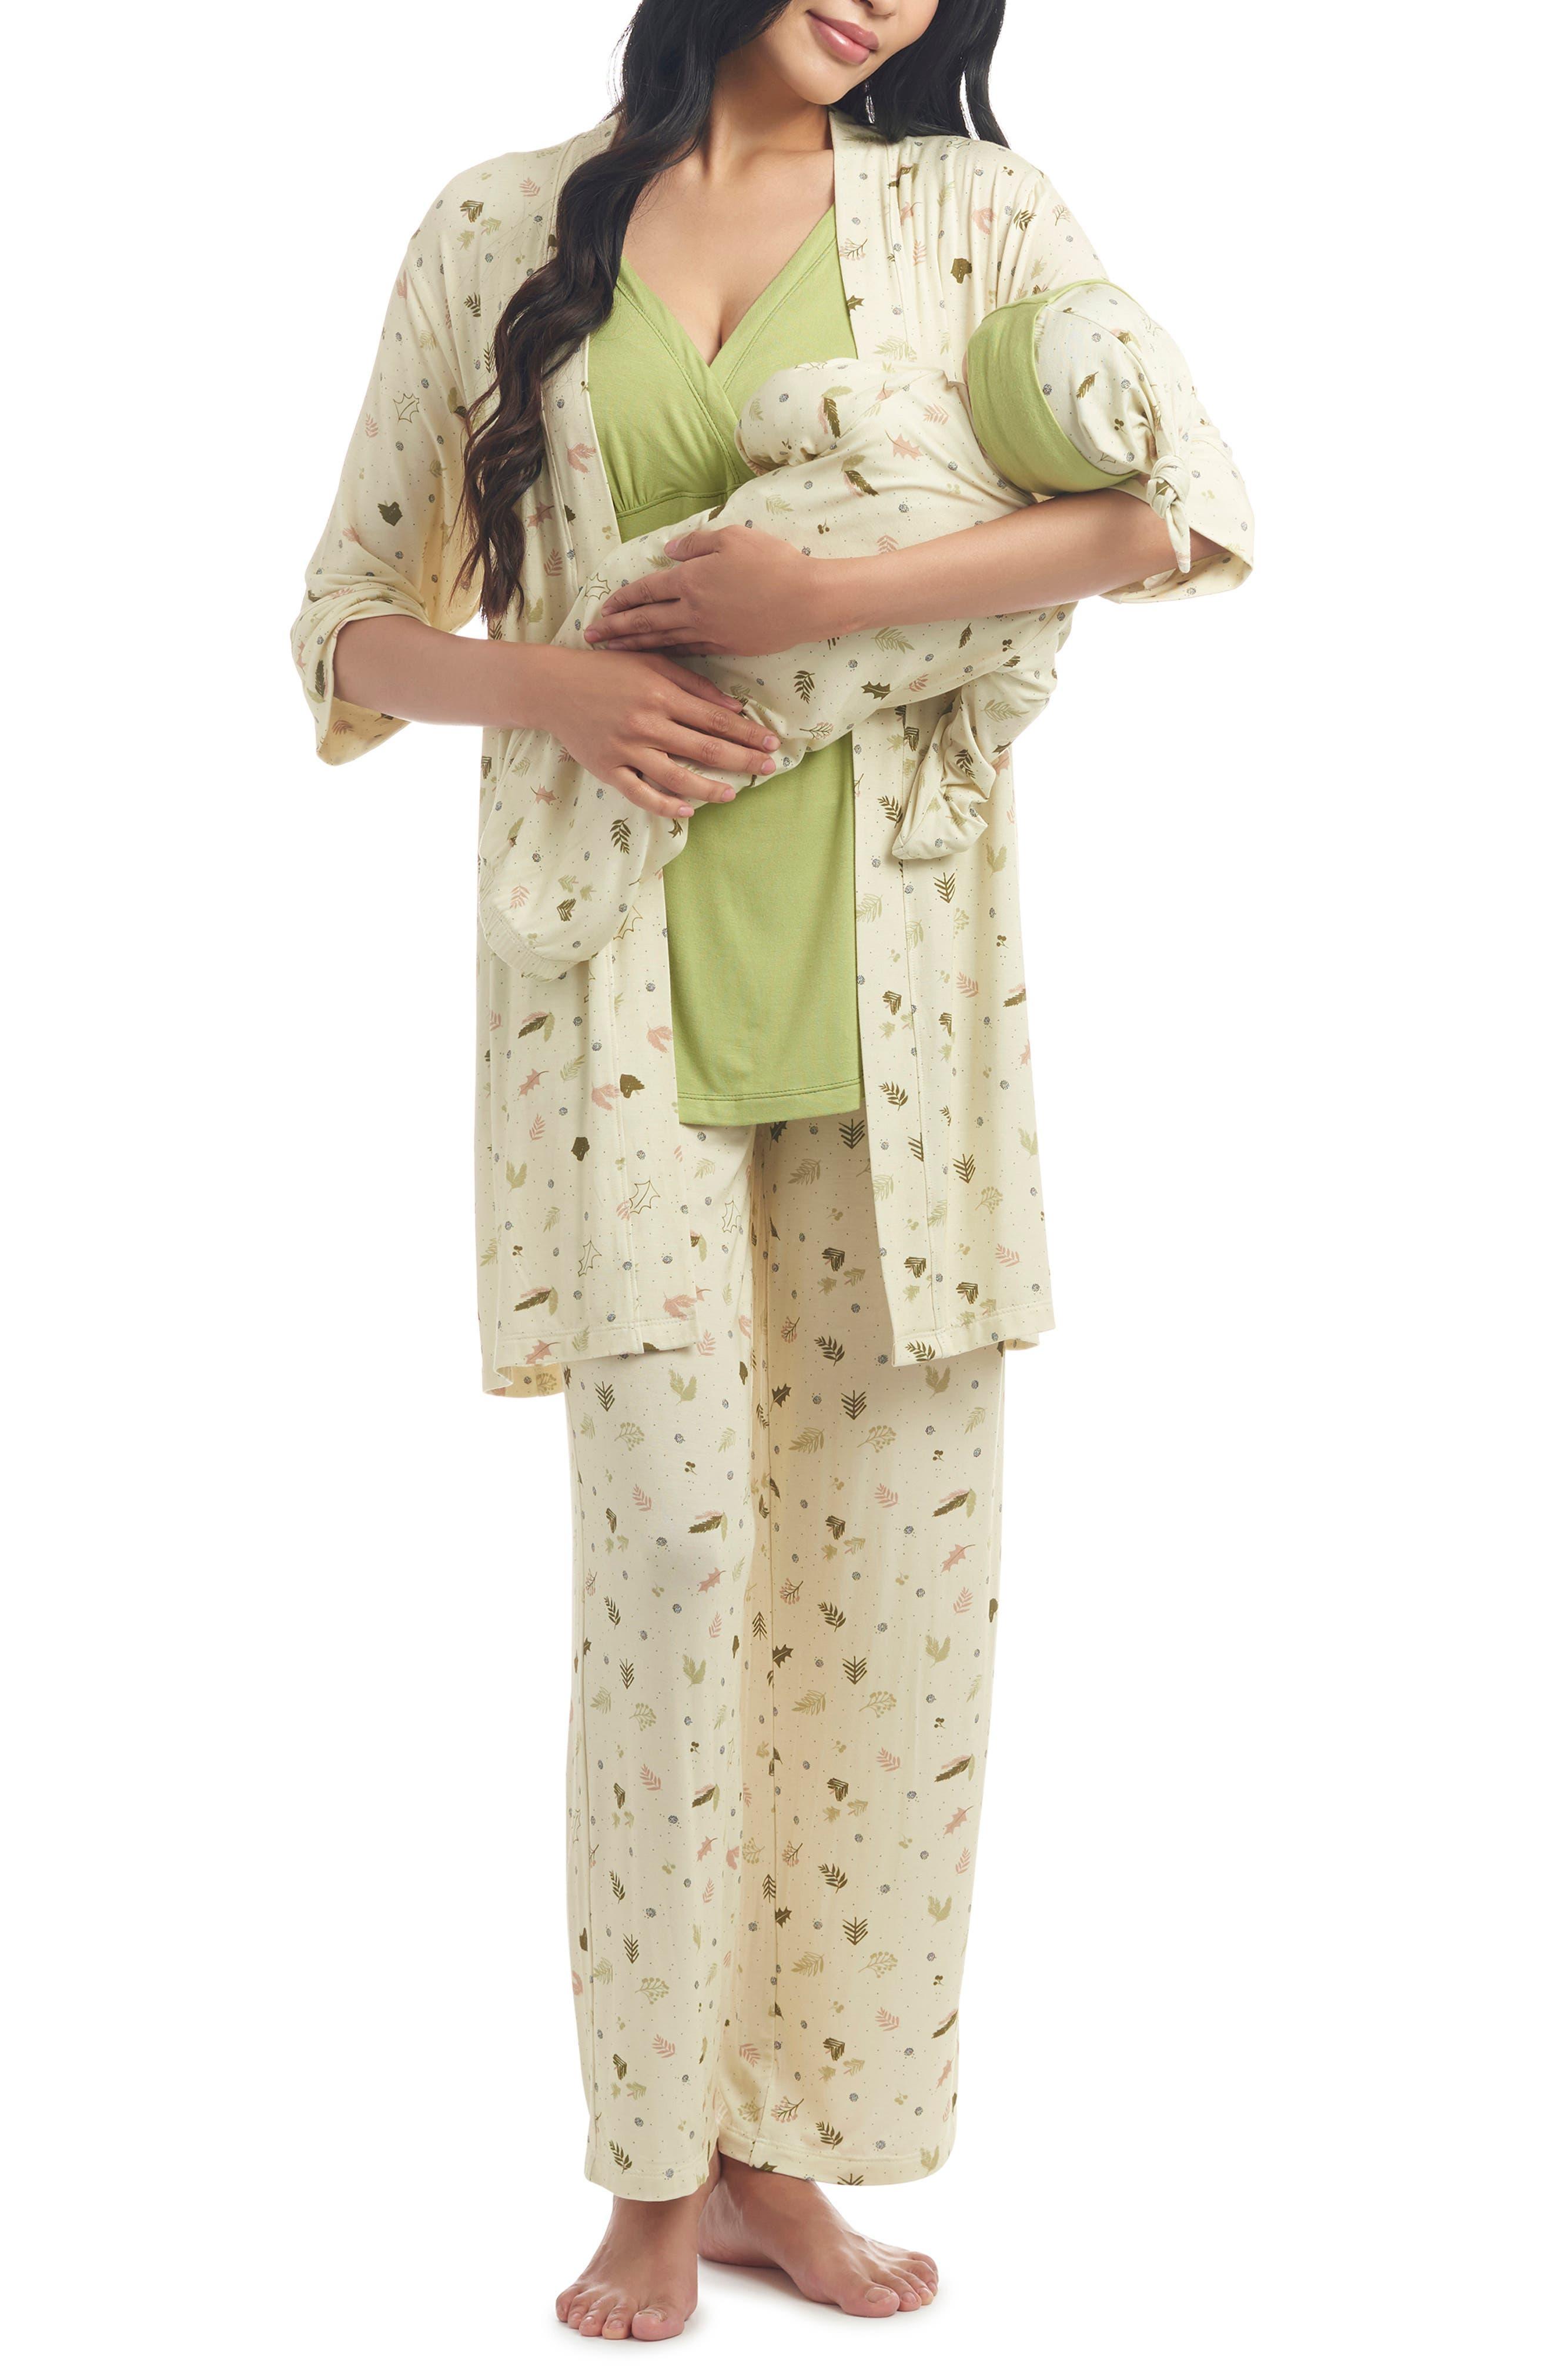 Analise During & After 5-Piece Maternity/nursing Sleep Set